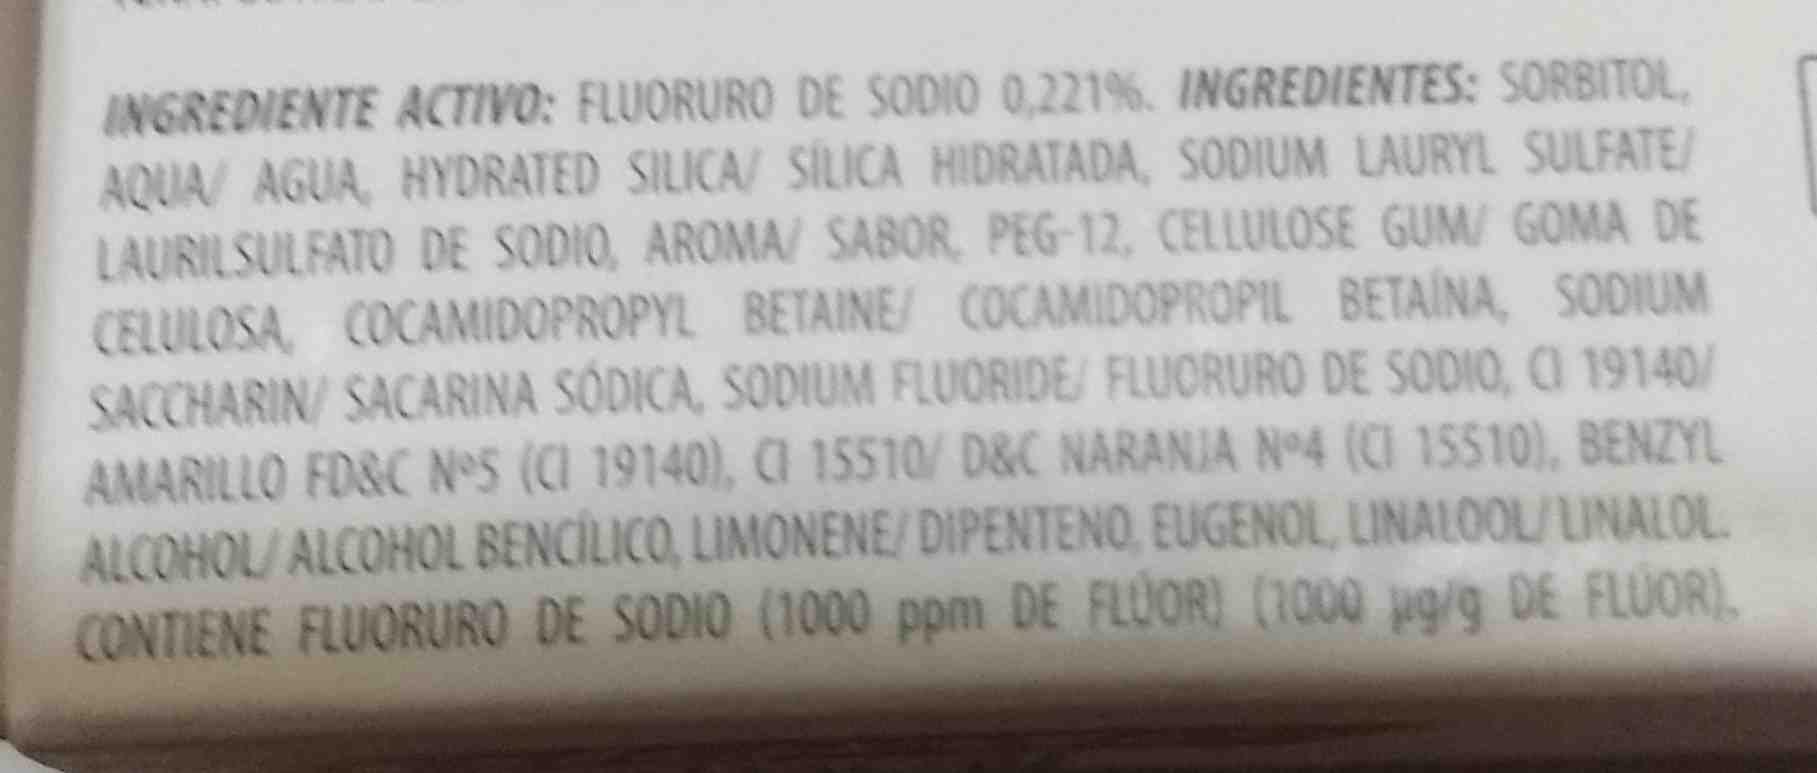 colgate natural extracts - Ingredients - en